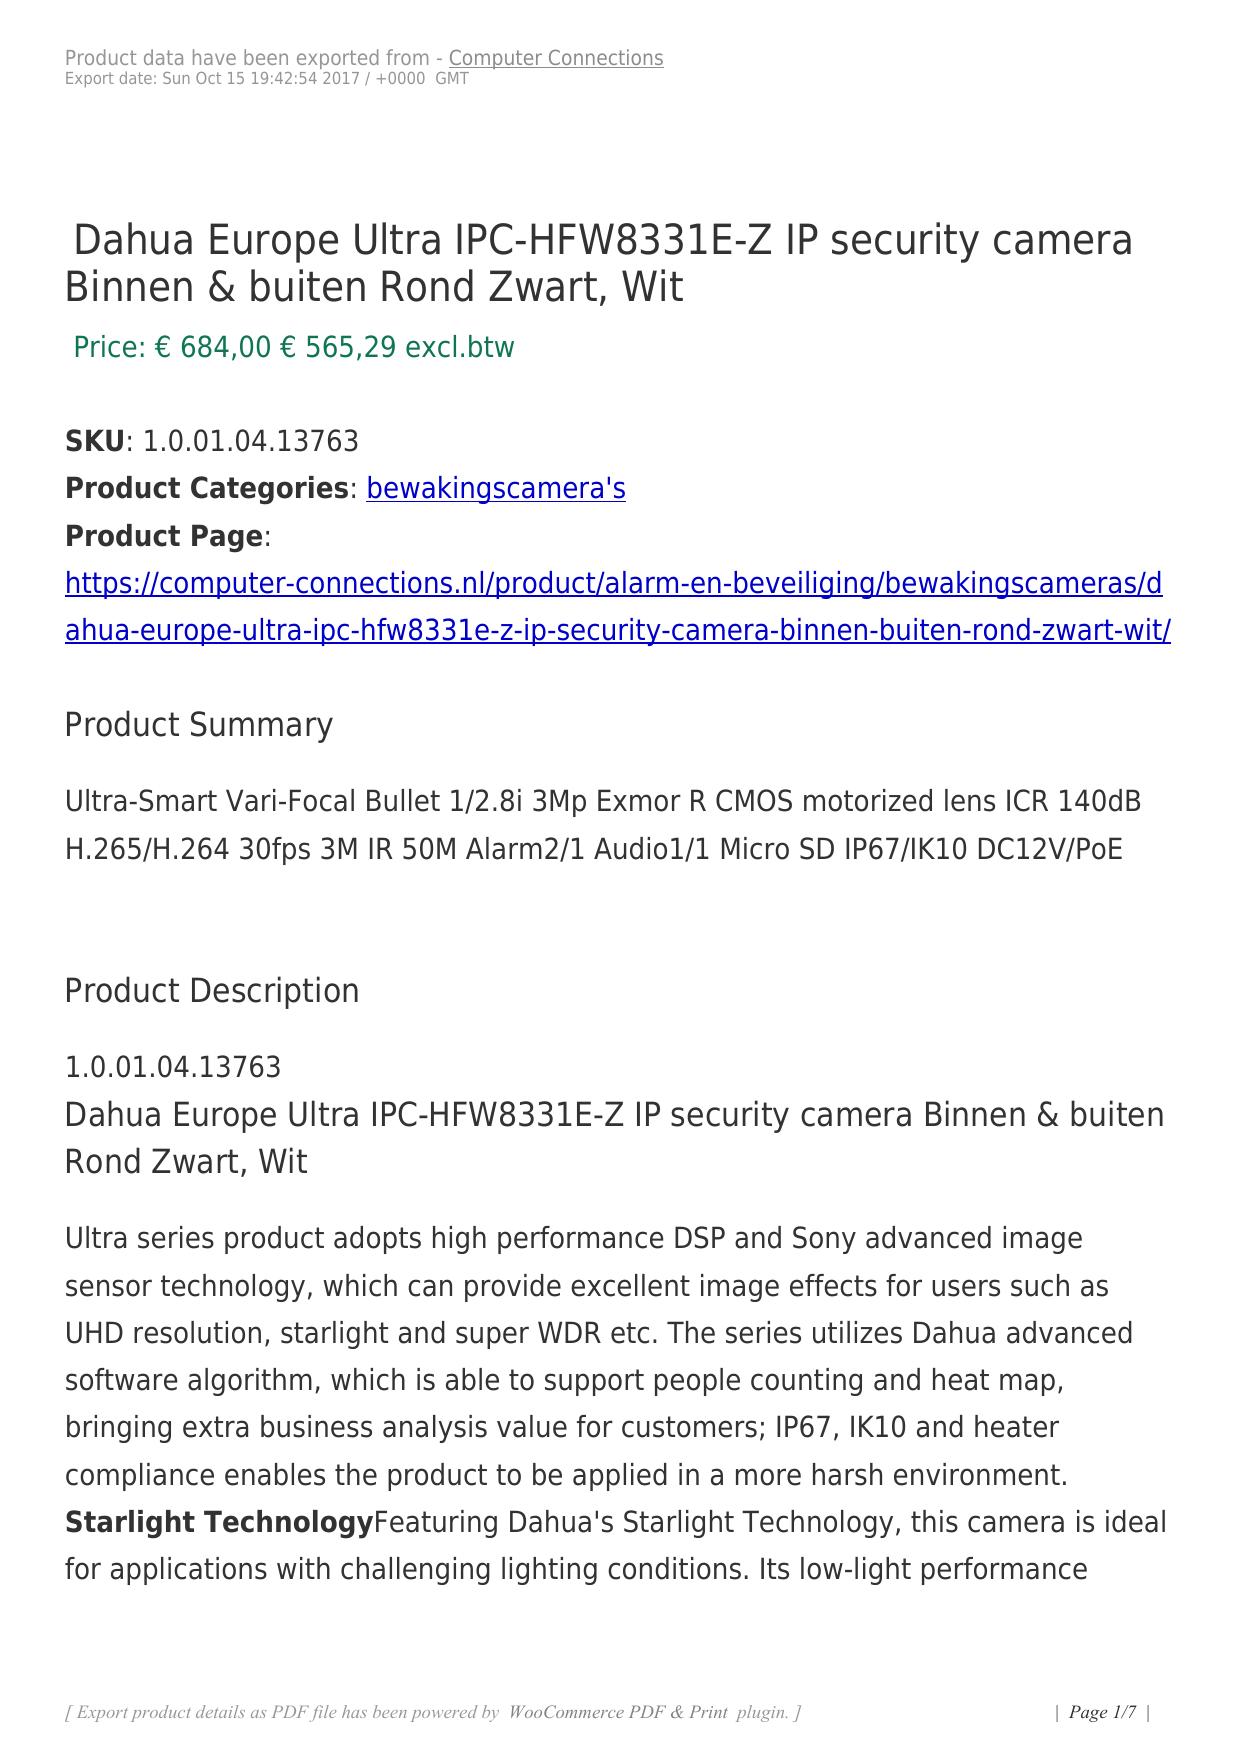 Dahua Europe Ultra IPC-HFW8331E-Z IP security camera Binnen